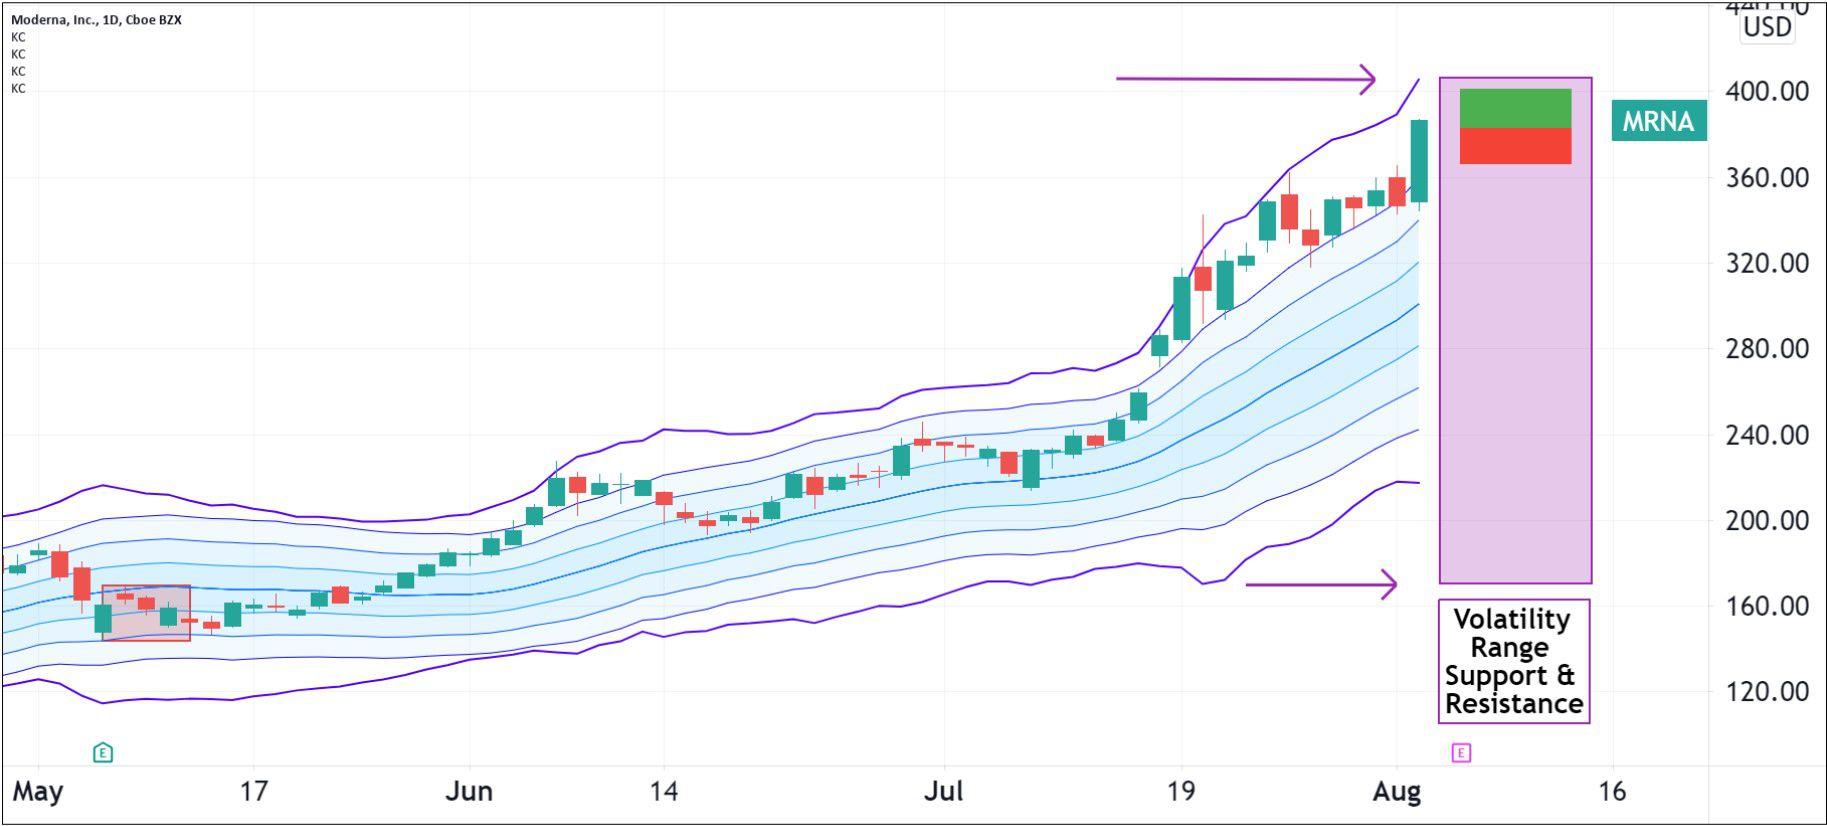 Volatility pattern for Moderna, Inc. (MRNA)